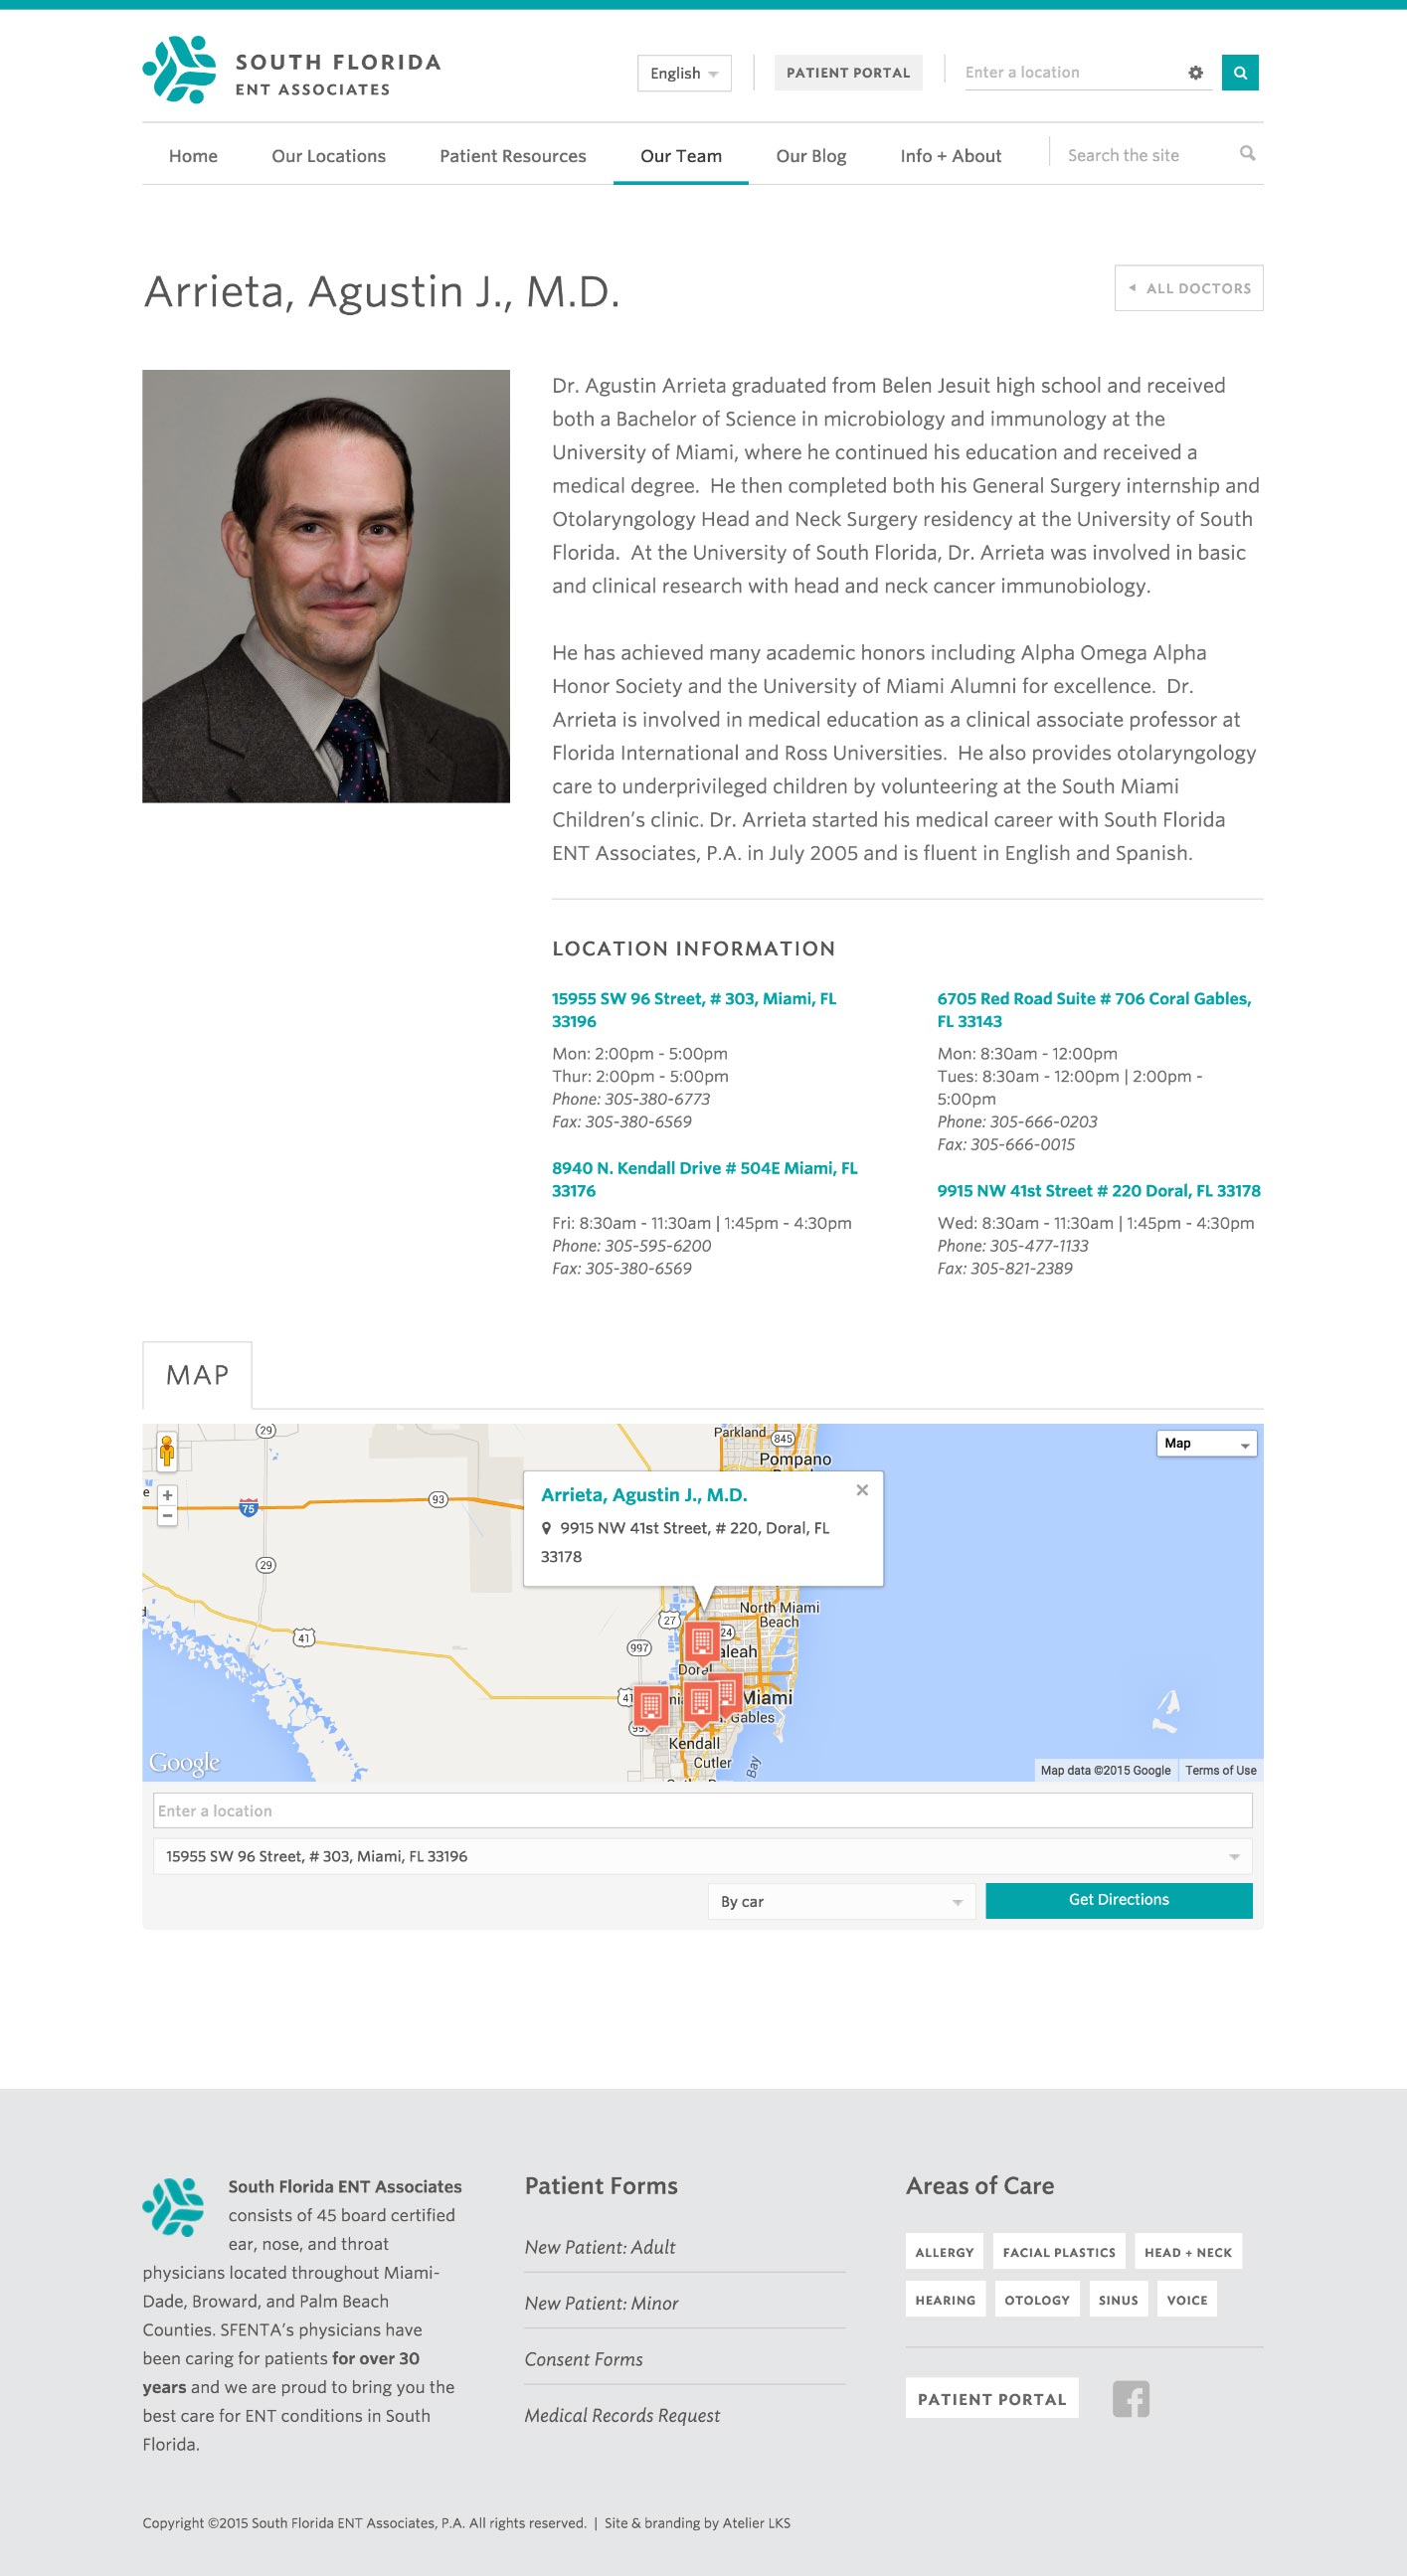 web design and development: South Florida ENT Associates